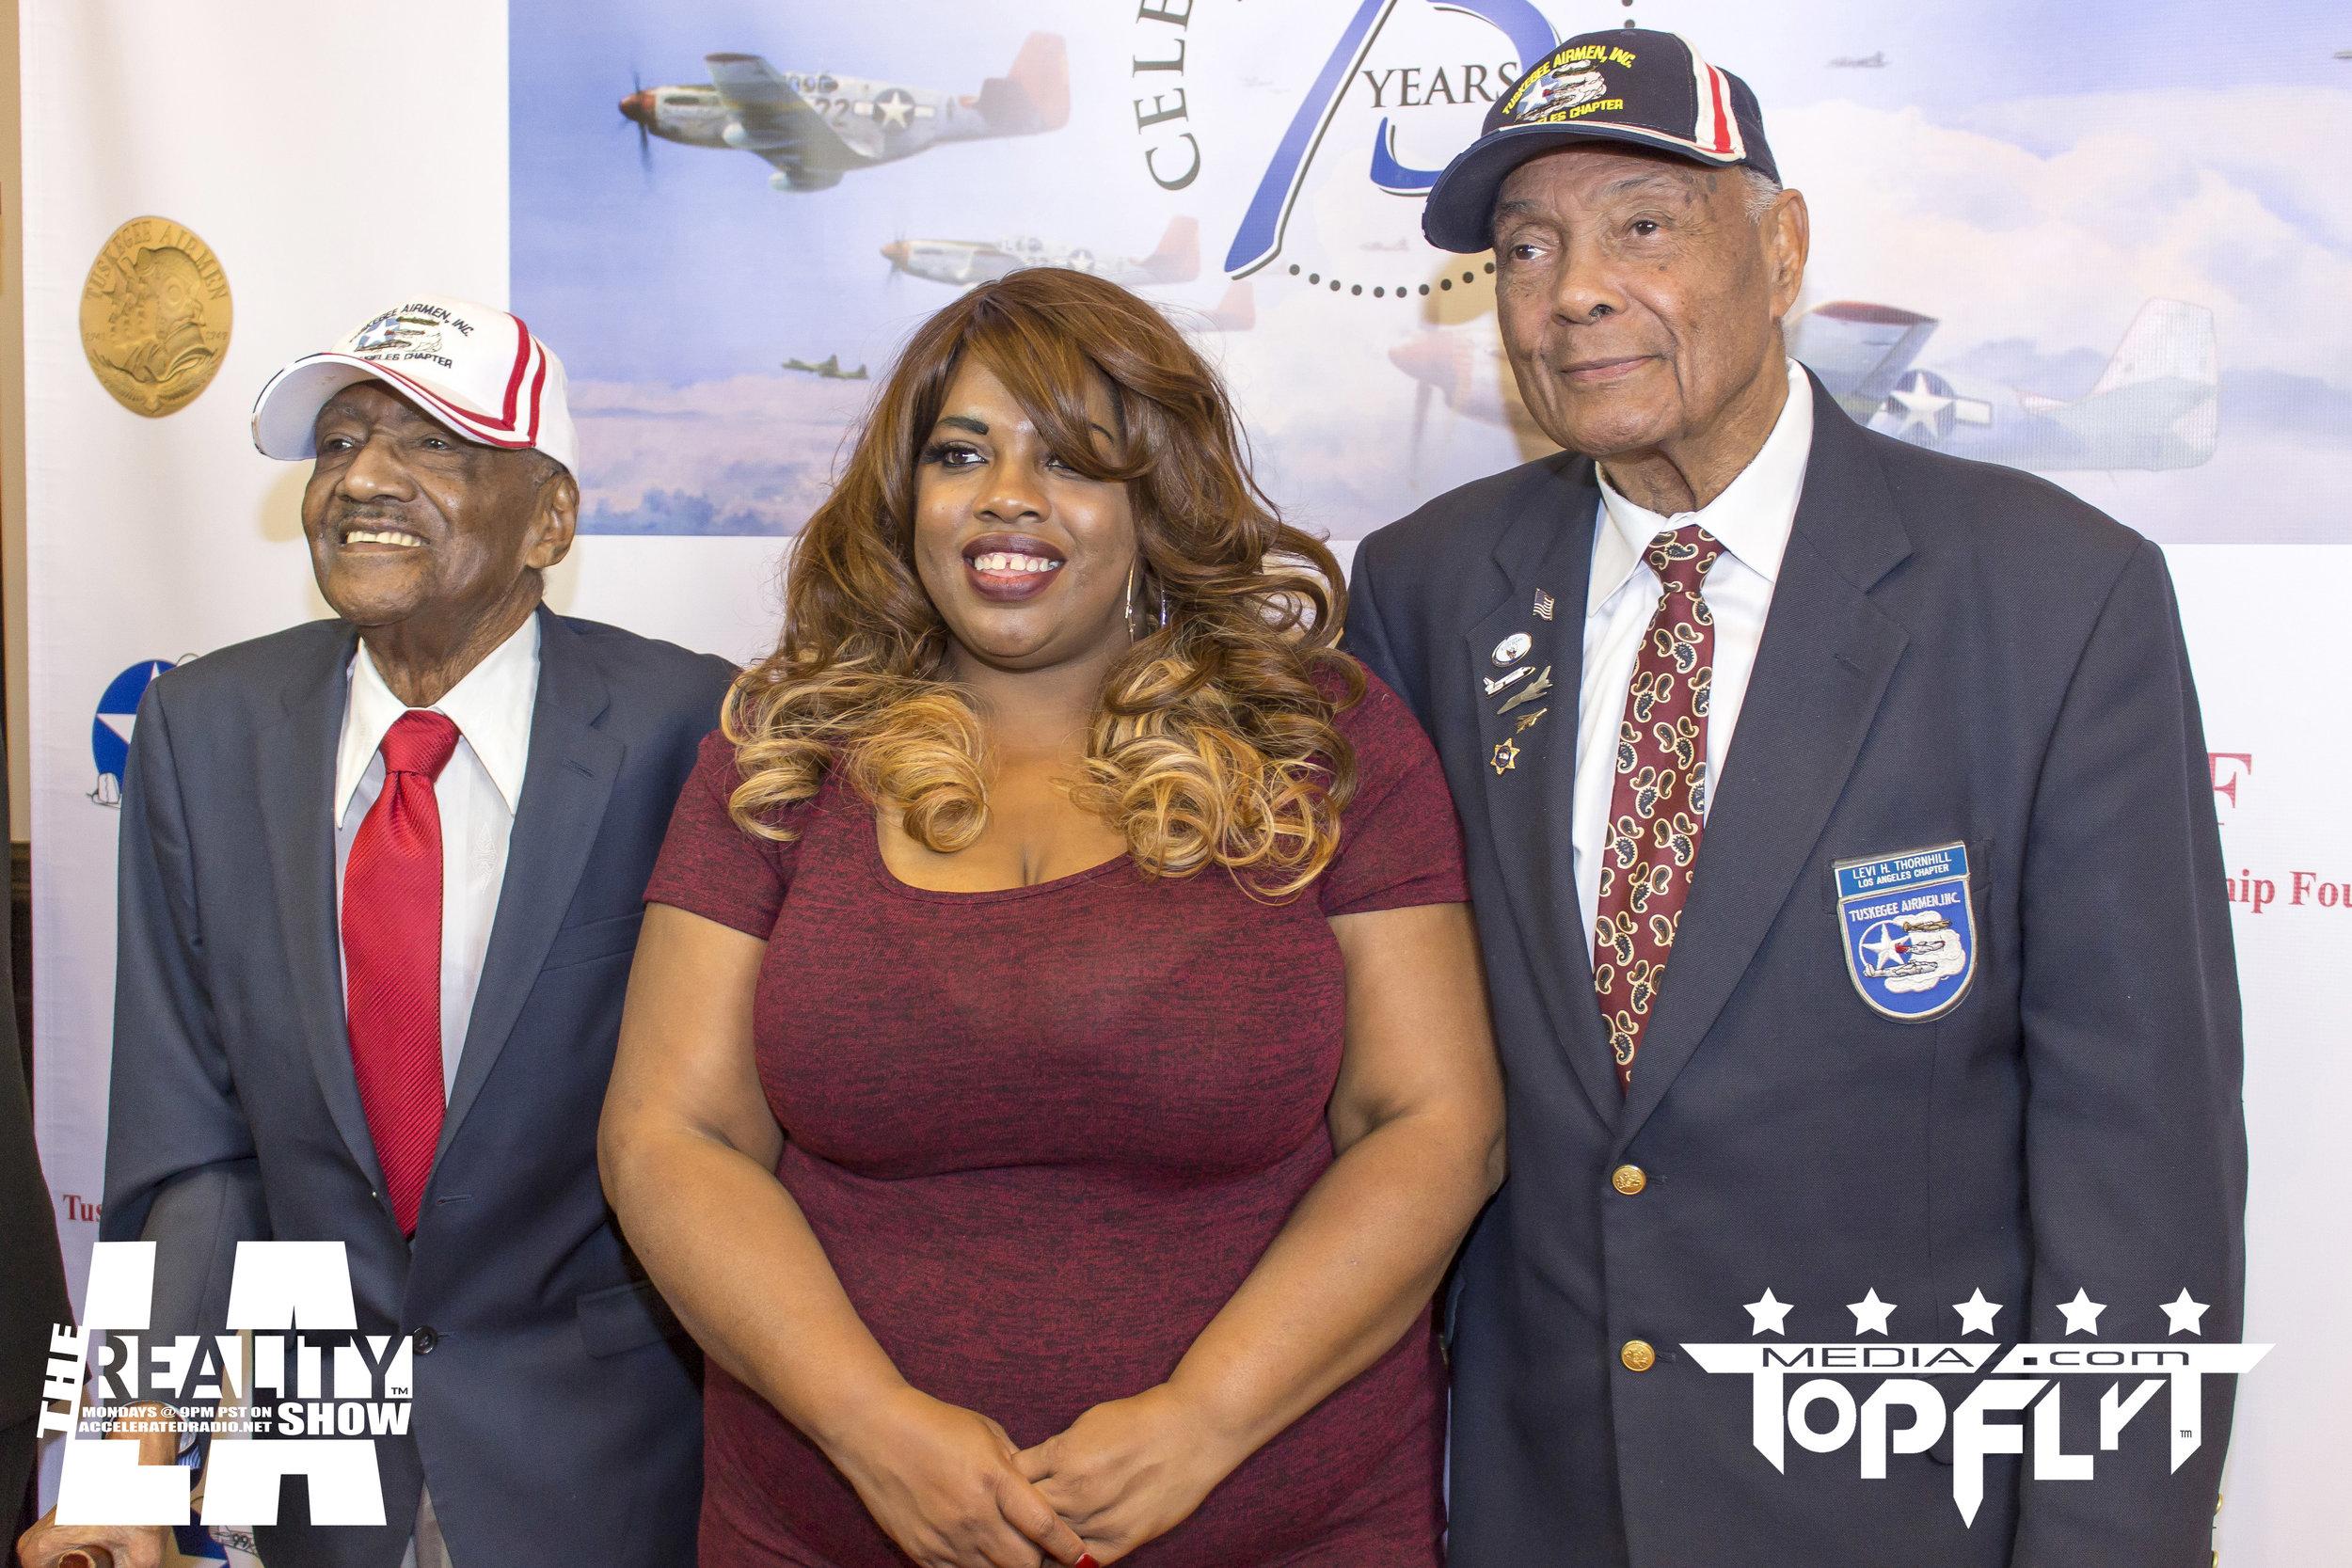 The Reality Show LA - Tuskegee Airmen 75th Anniversary VIP Reception_27.jpg